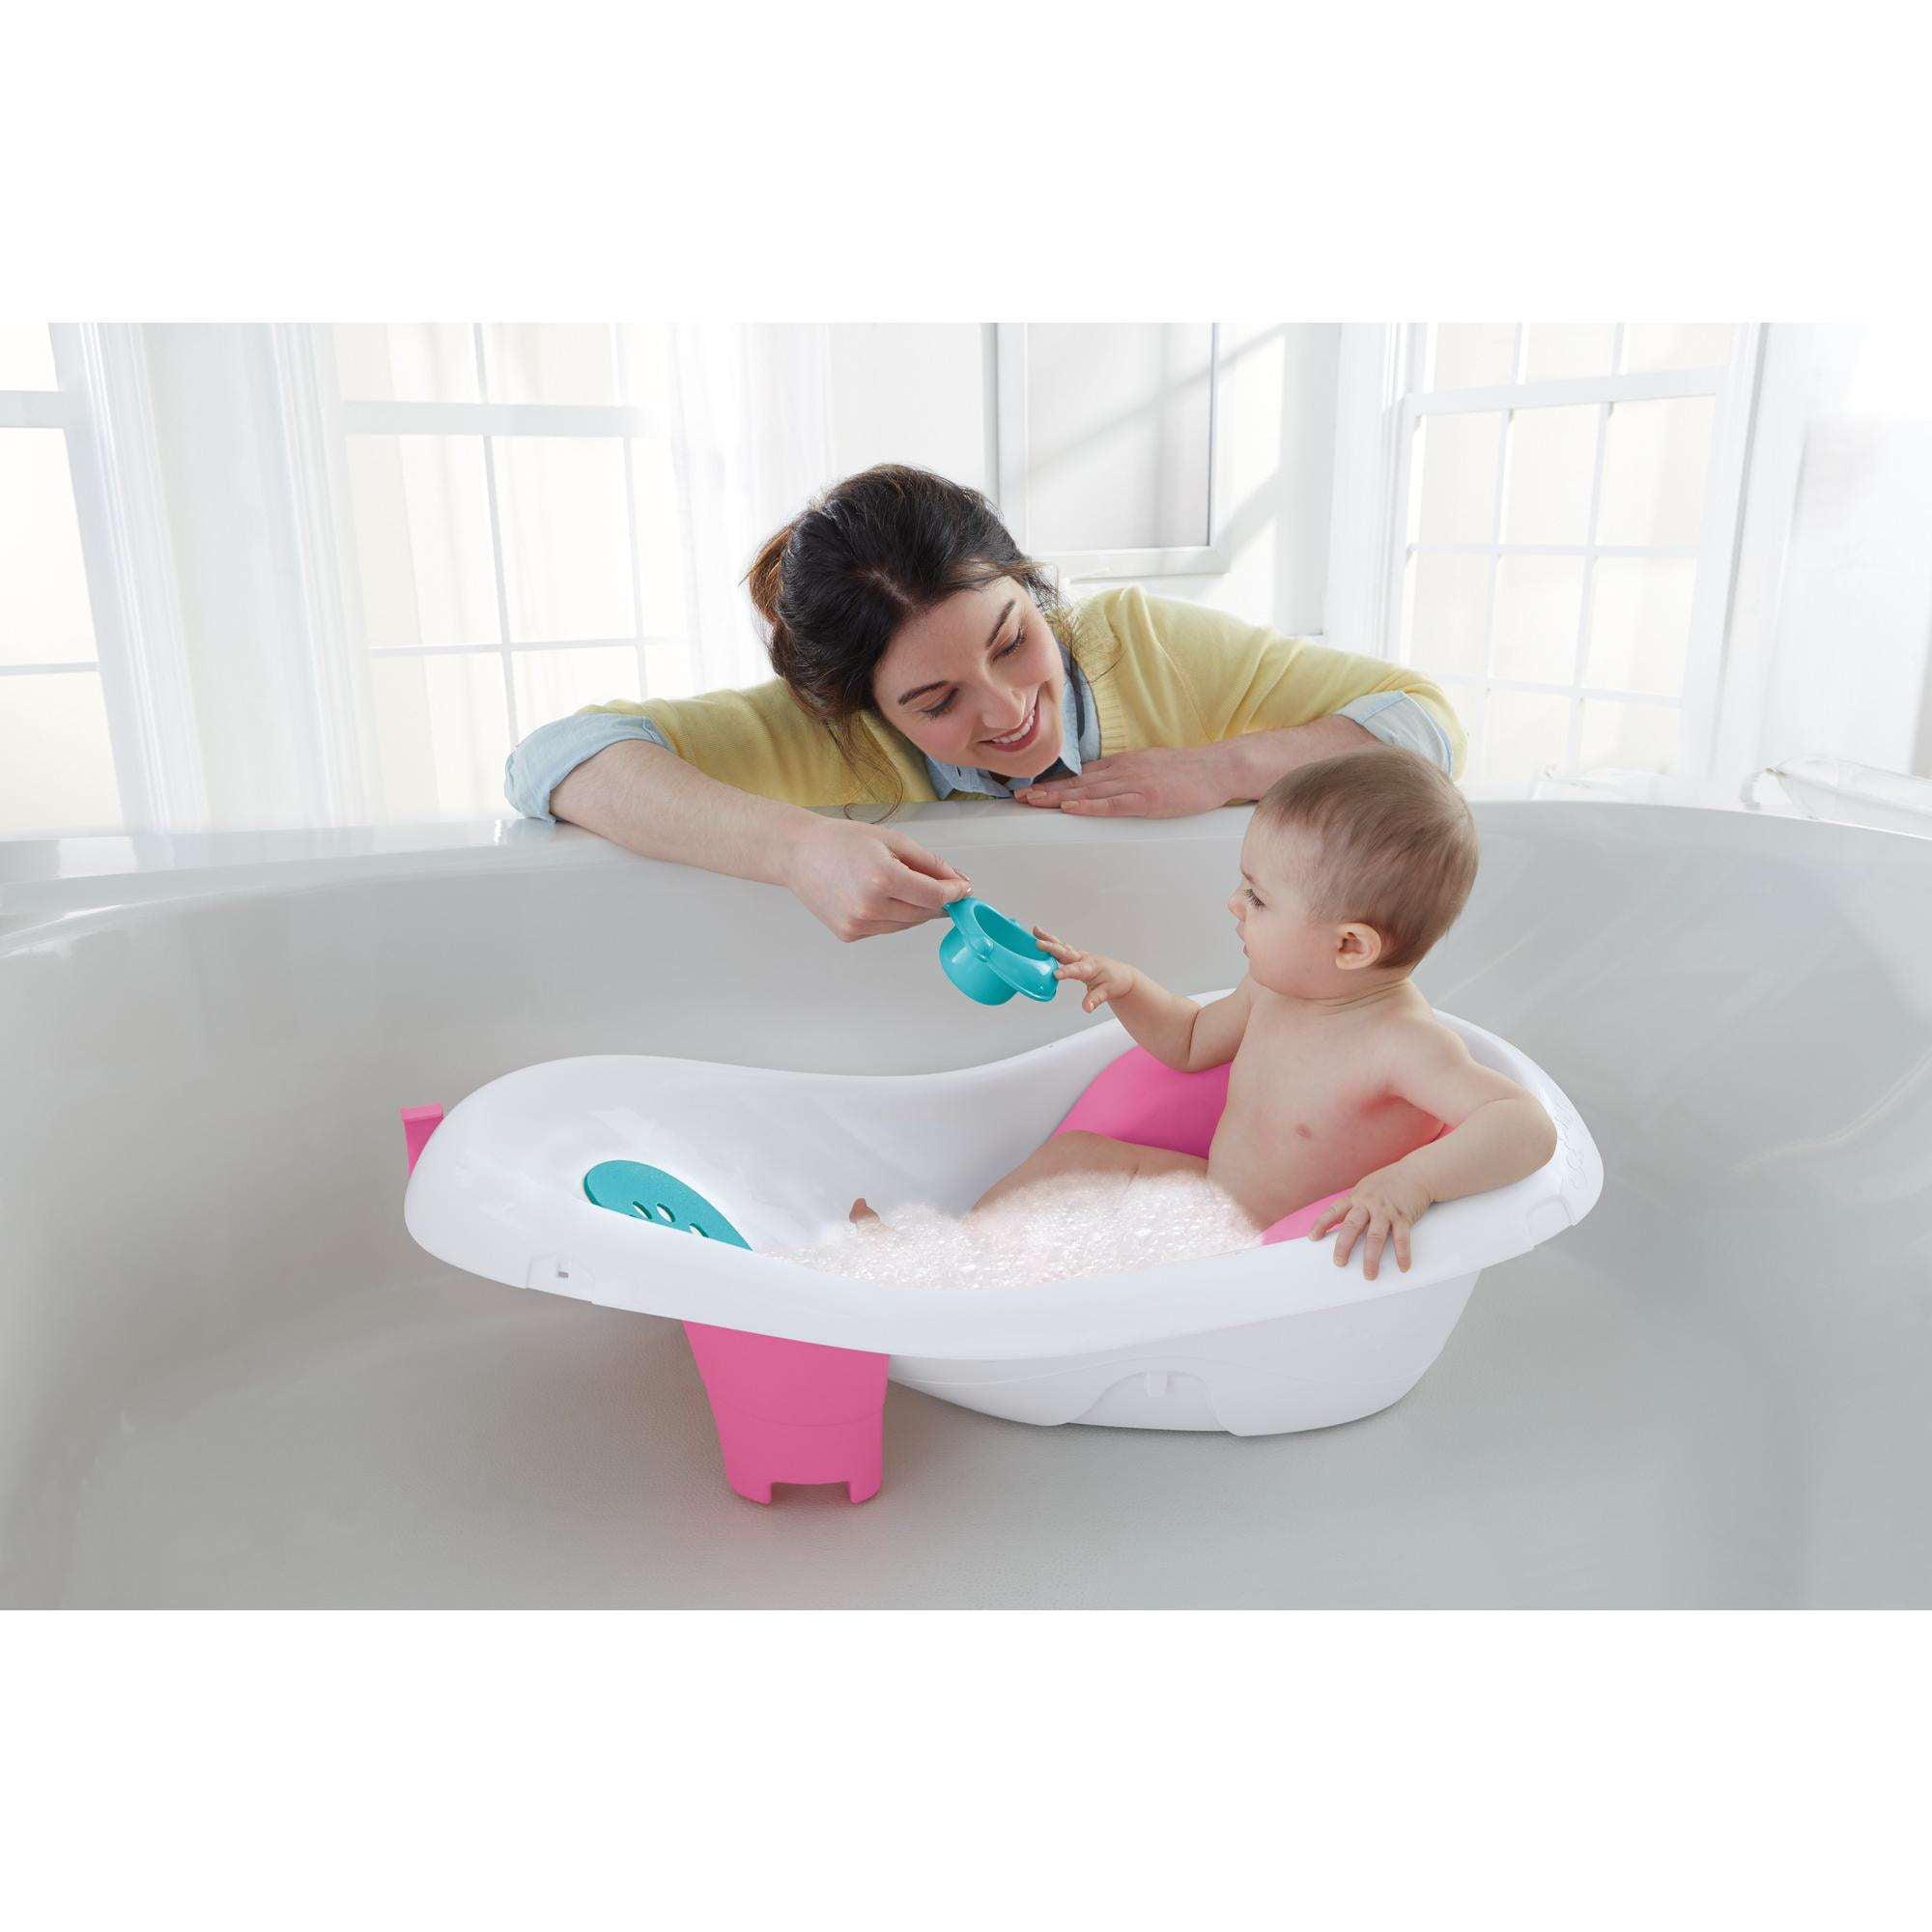 Fisher-Price 4-in-1 Sling \'n Seat Tub, Pink - Walmart.com